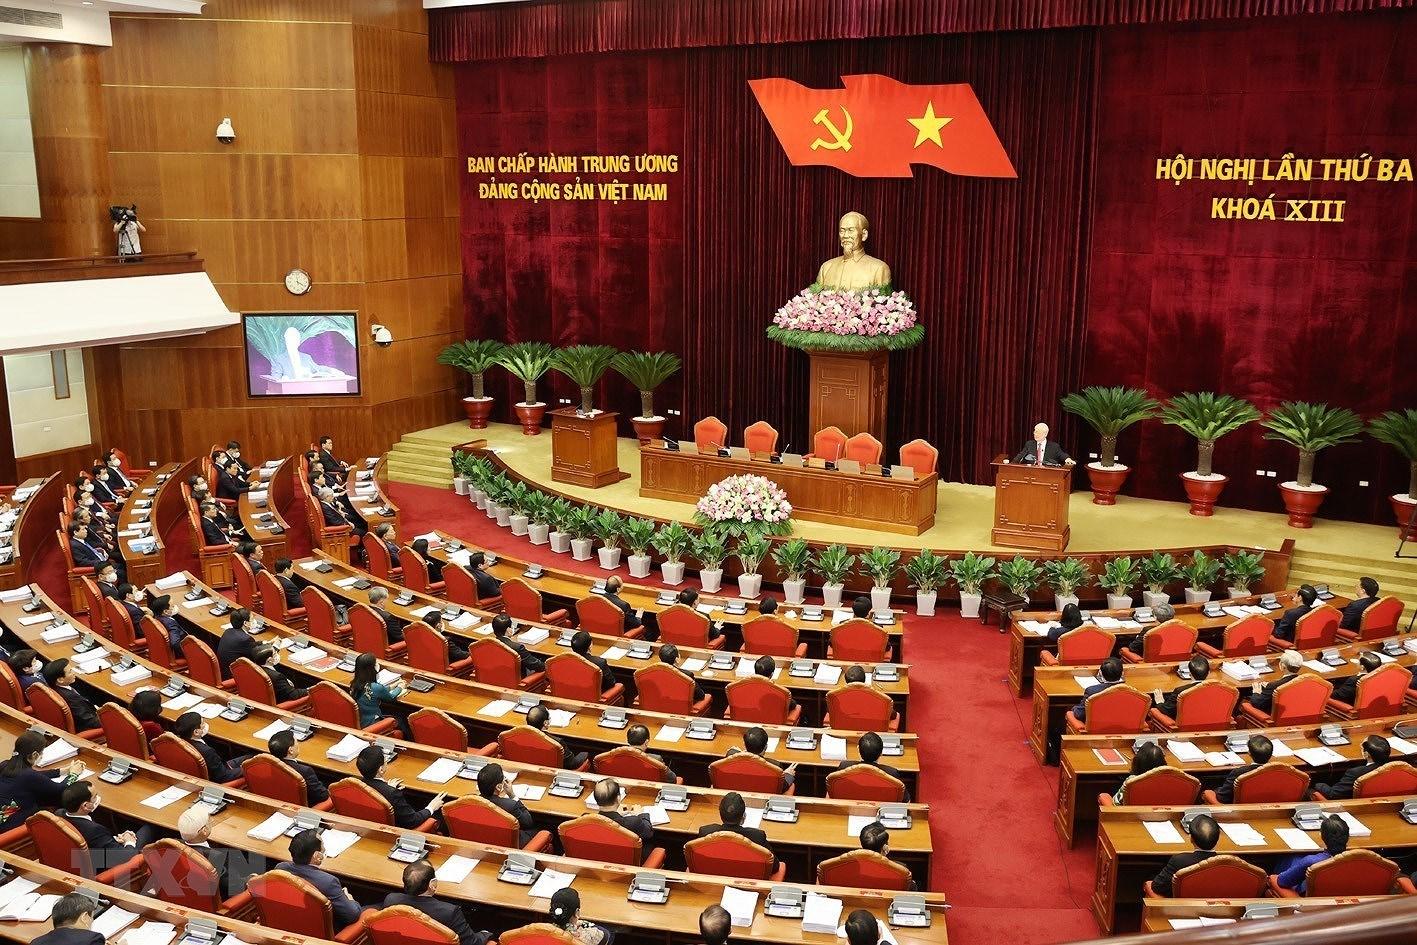 Be mac Hoi nghi lan thu ba Ban Chap hanh Trung uong Dang khoa XIII hinh anh 6